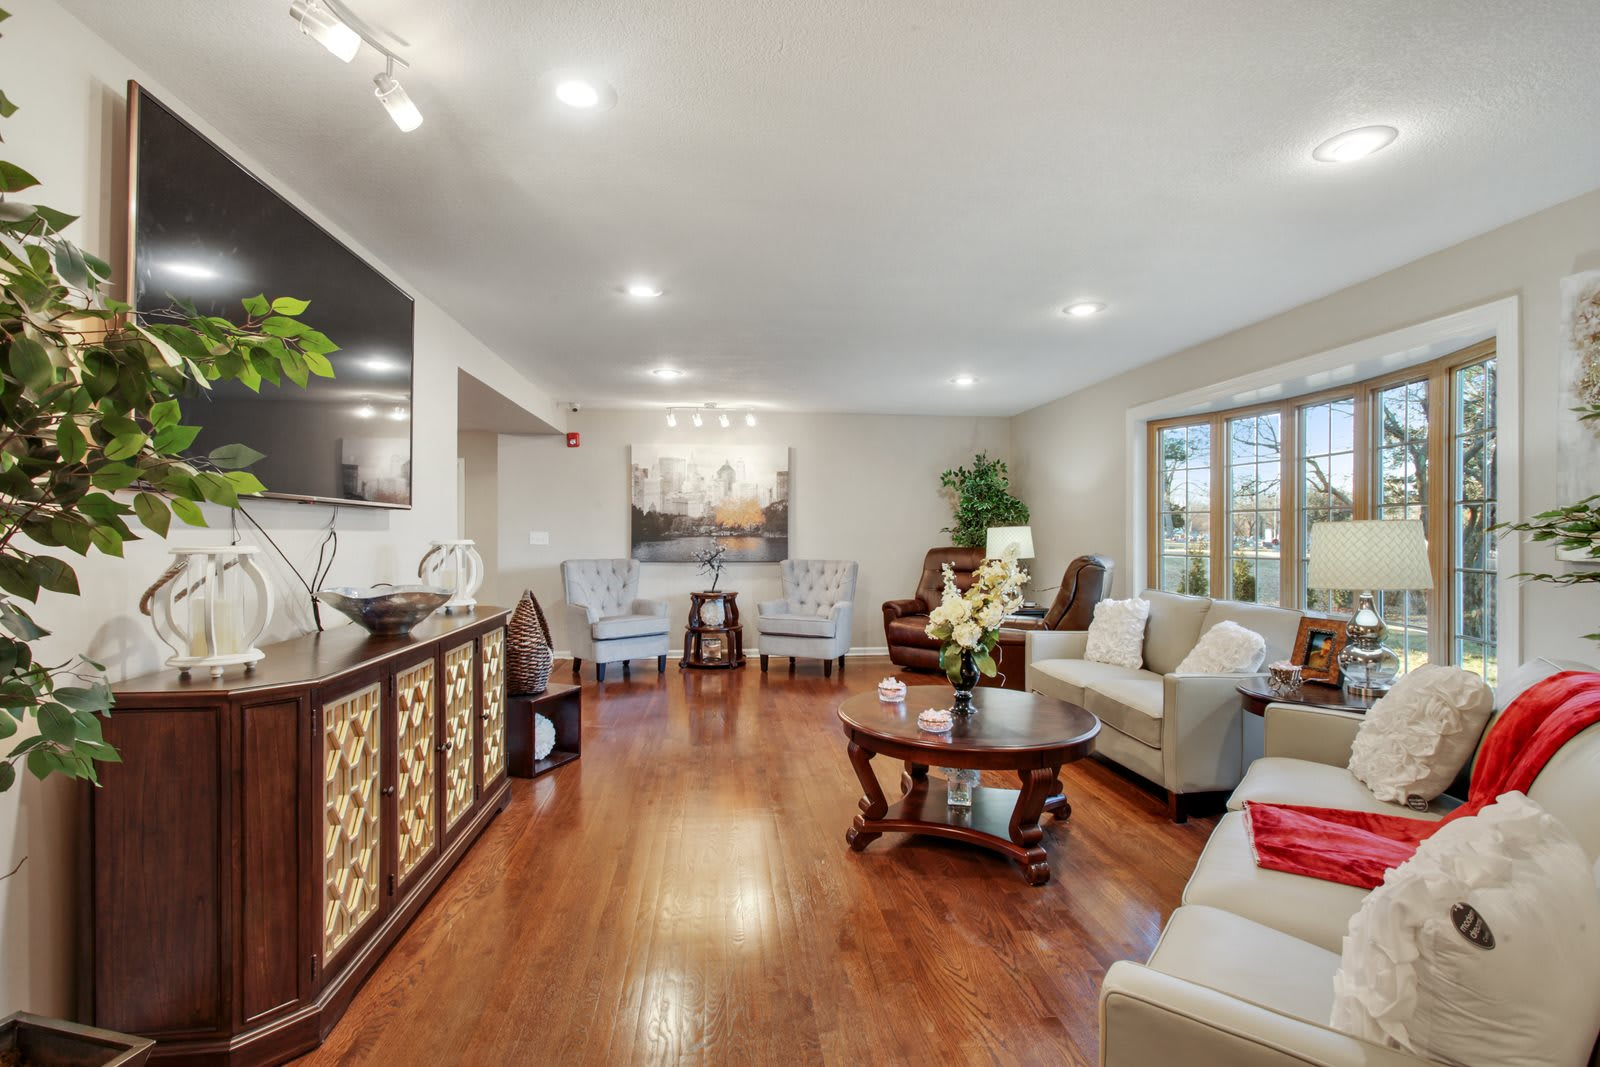 Photo 1 of Golden Oaks Home